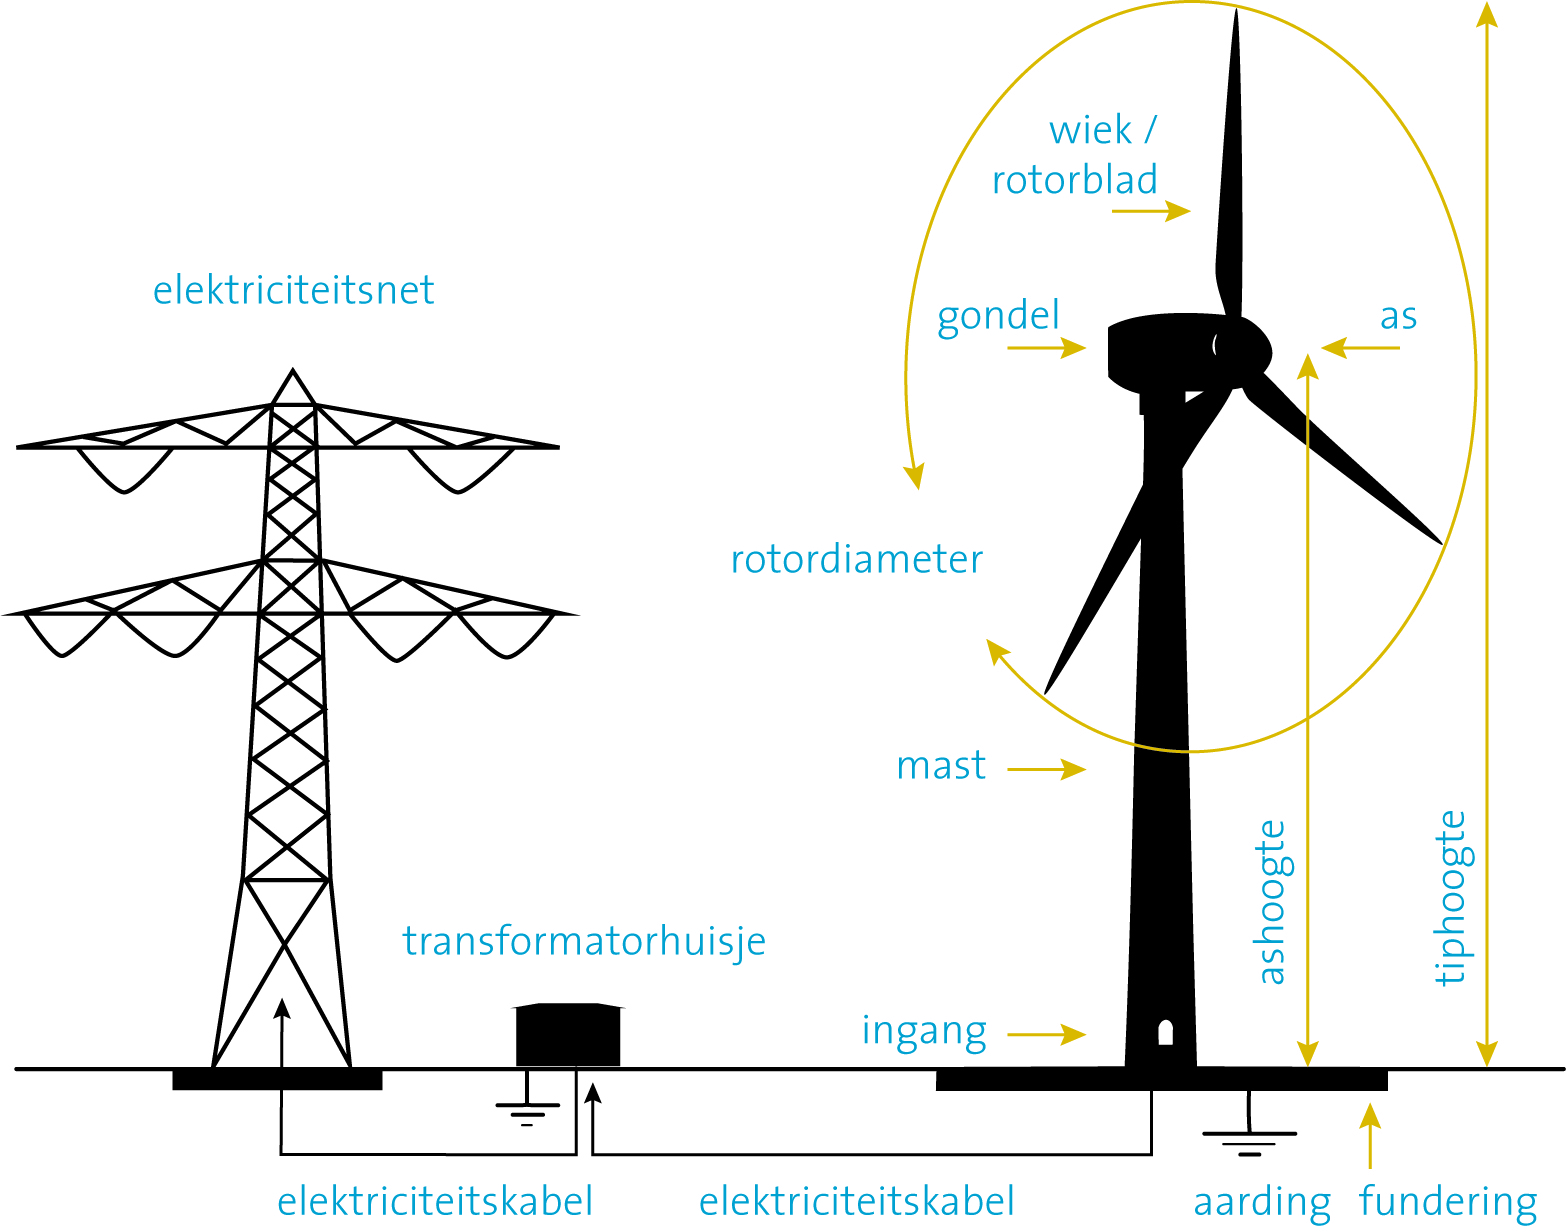 File:Windturbine onderdelen.jpg - Wikimedia Commons